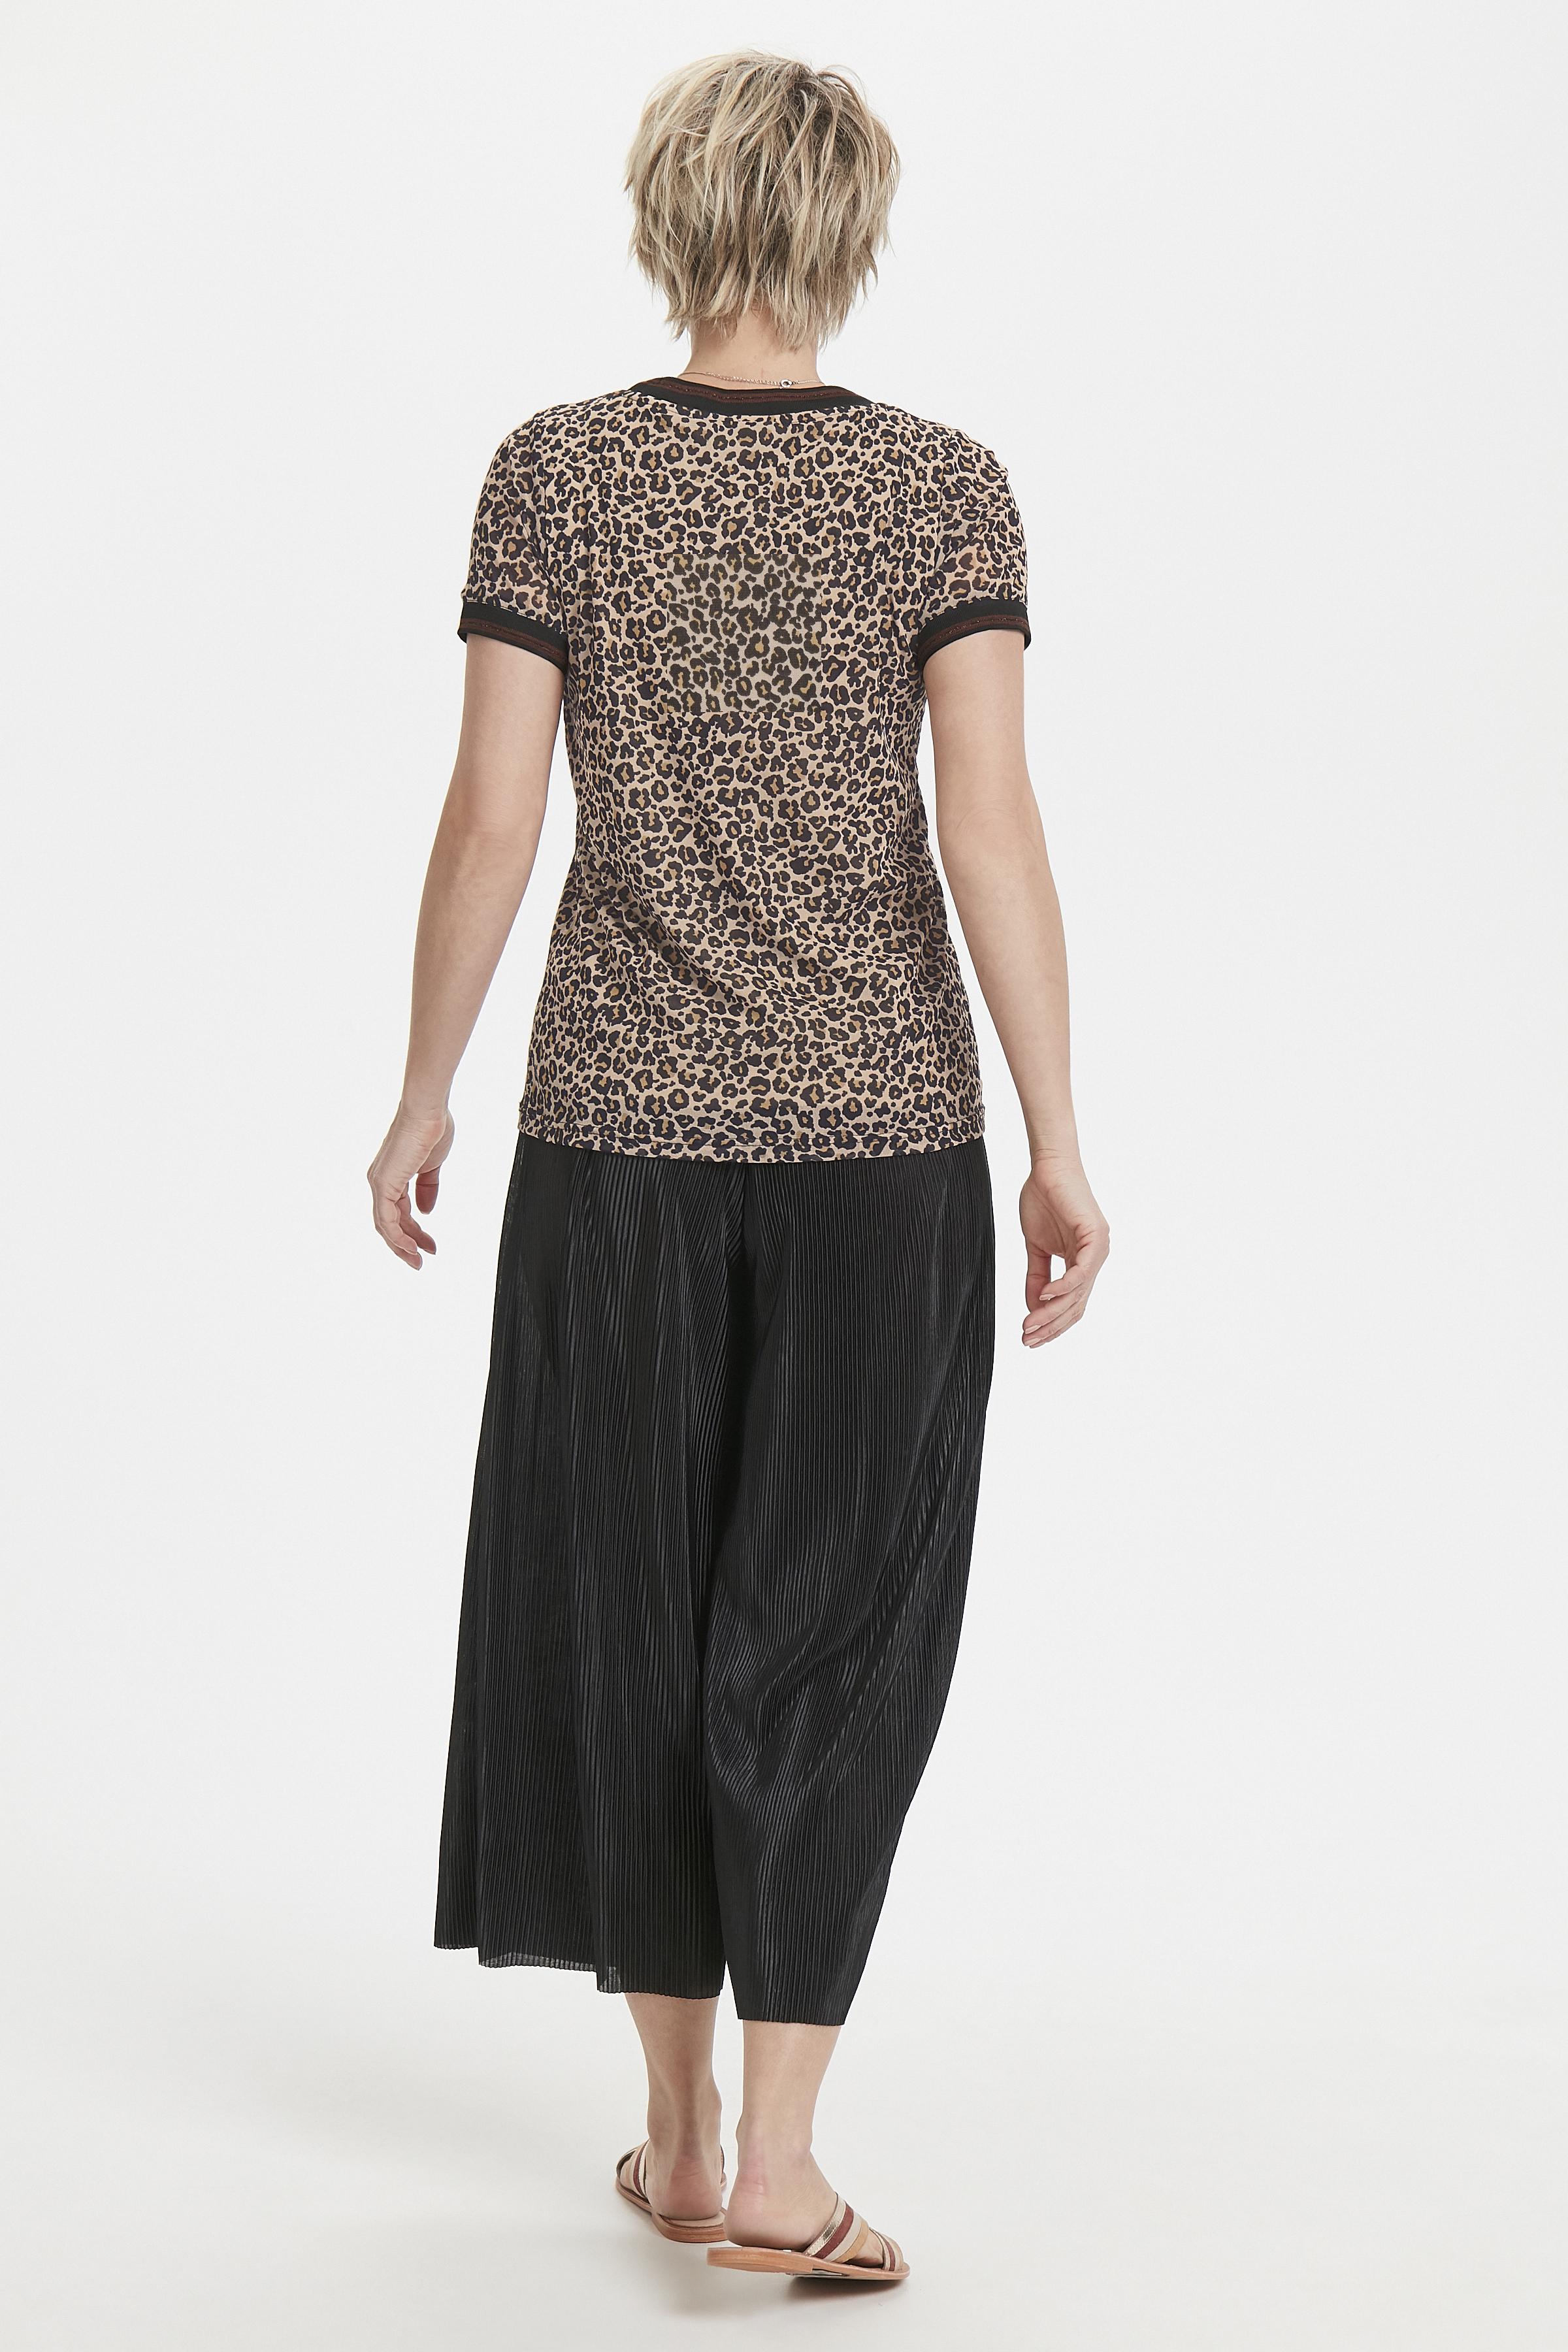 Zwart/zand Korte mouwen shirt  van Bon'A Parte – Door Zwart/zand Korte mouwen shirt  van maat. S-2XL hier